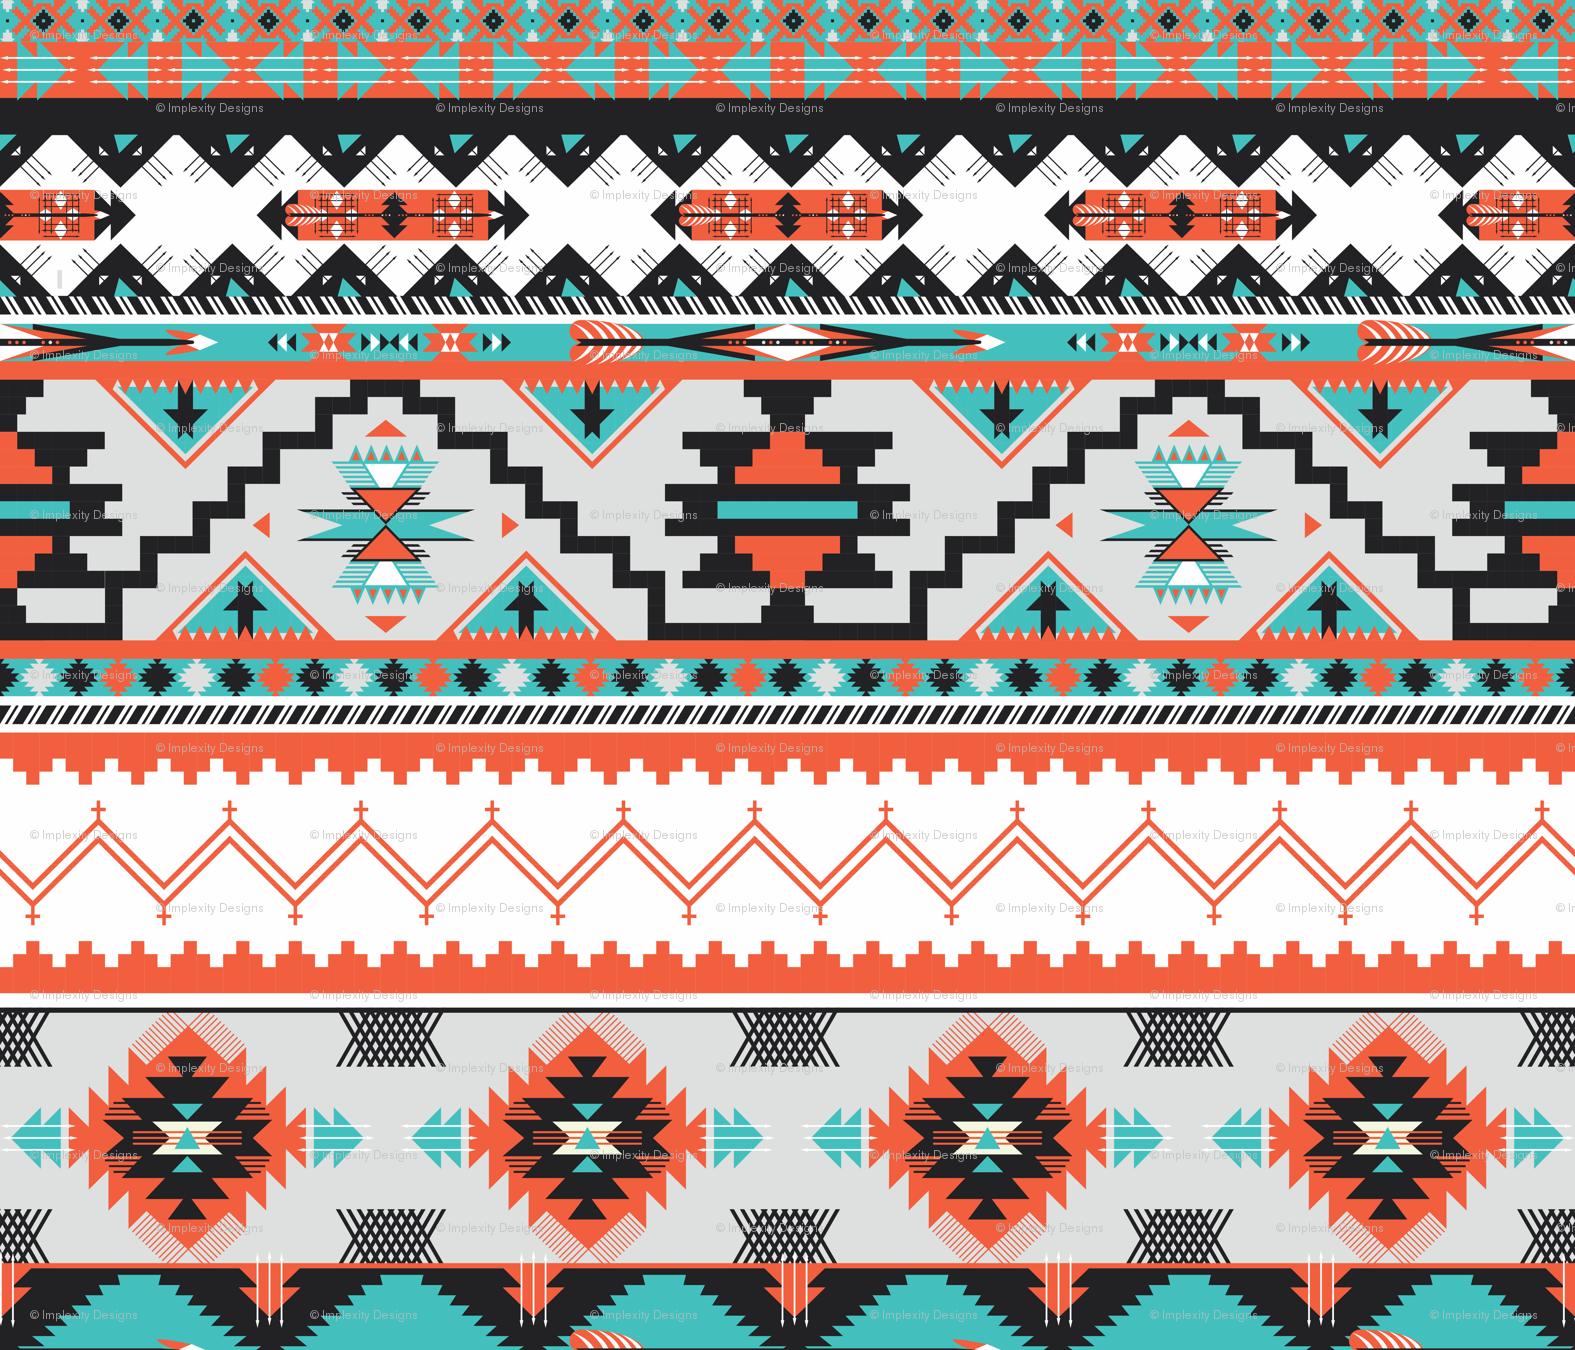 51dbcf2f8 Native American Tribal Patterns Wallpaper Native american fabric 1575x1350